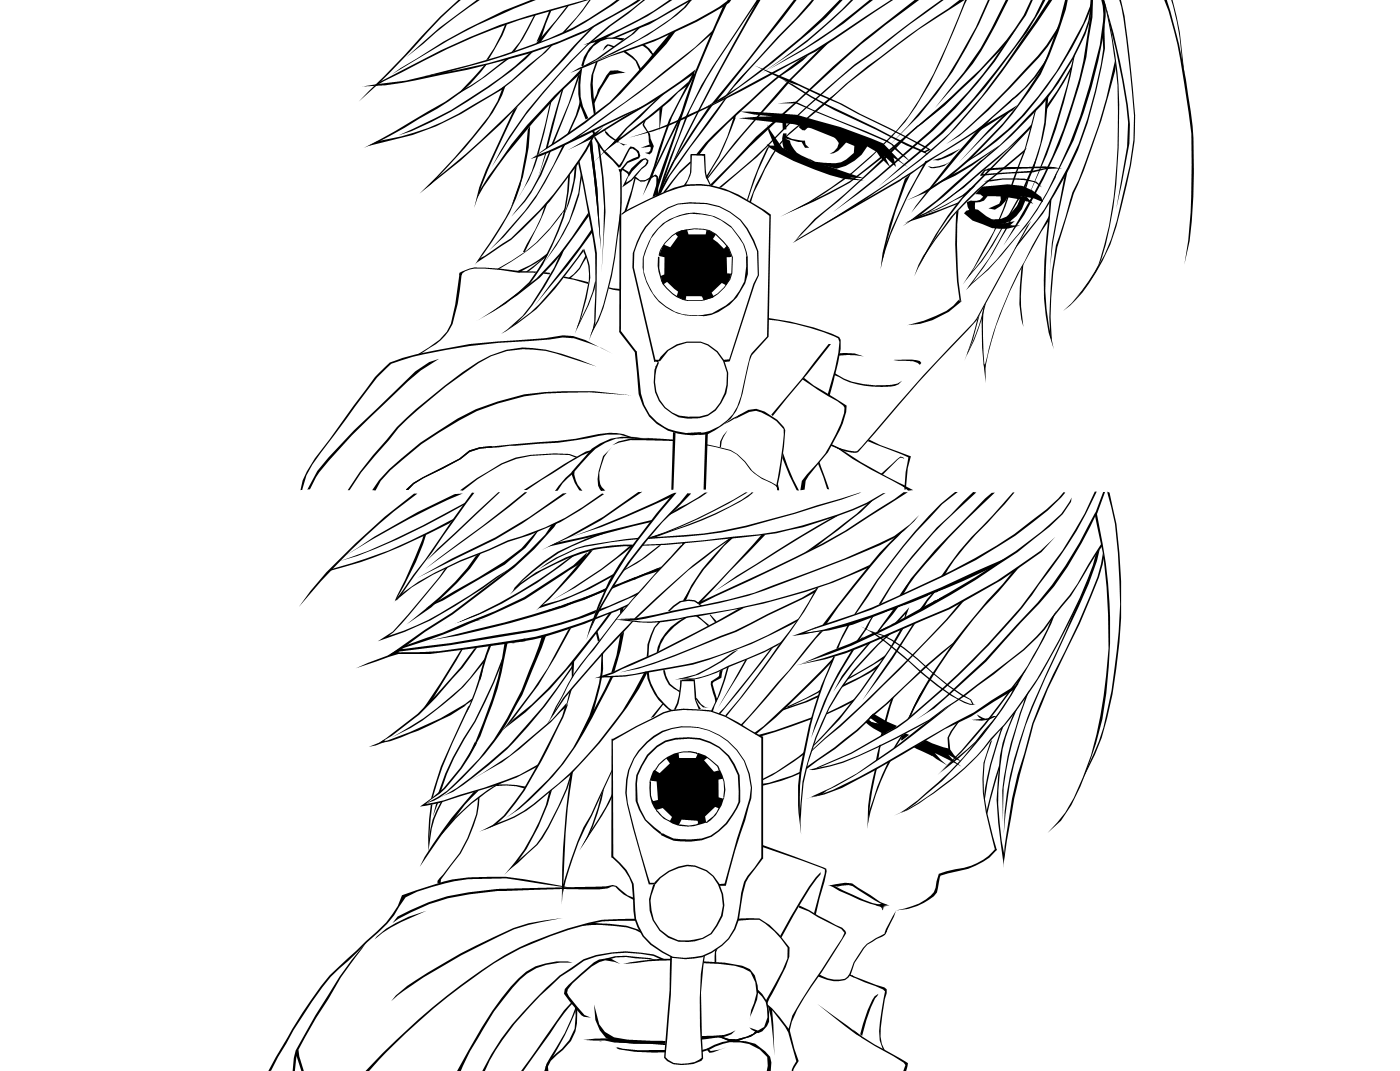 colored 141 lineart by enara123 on deviantart